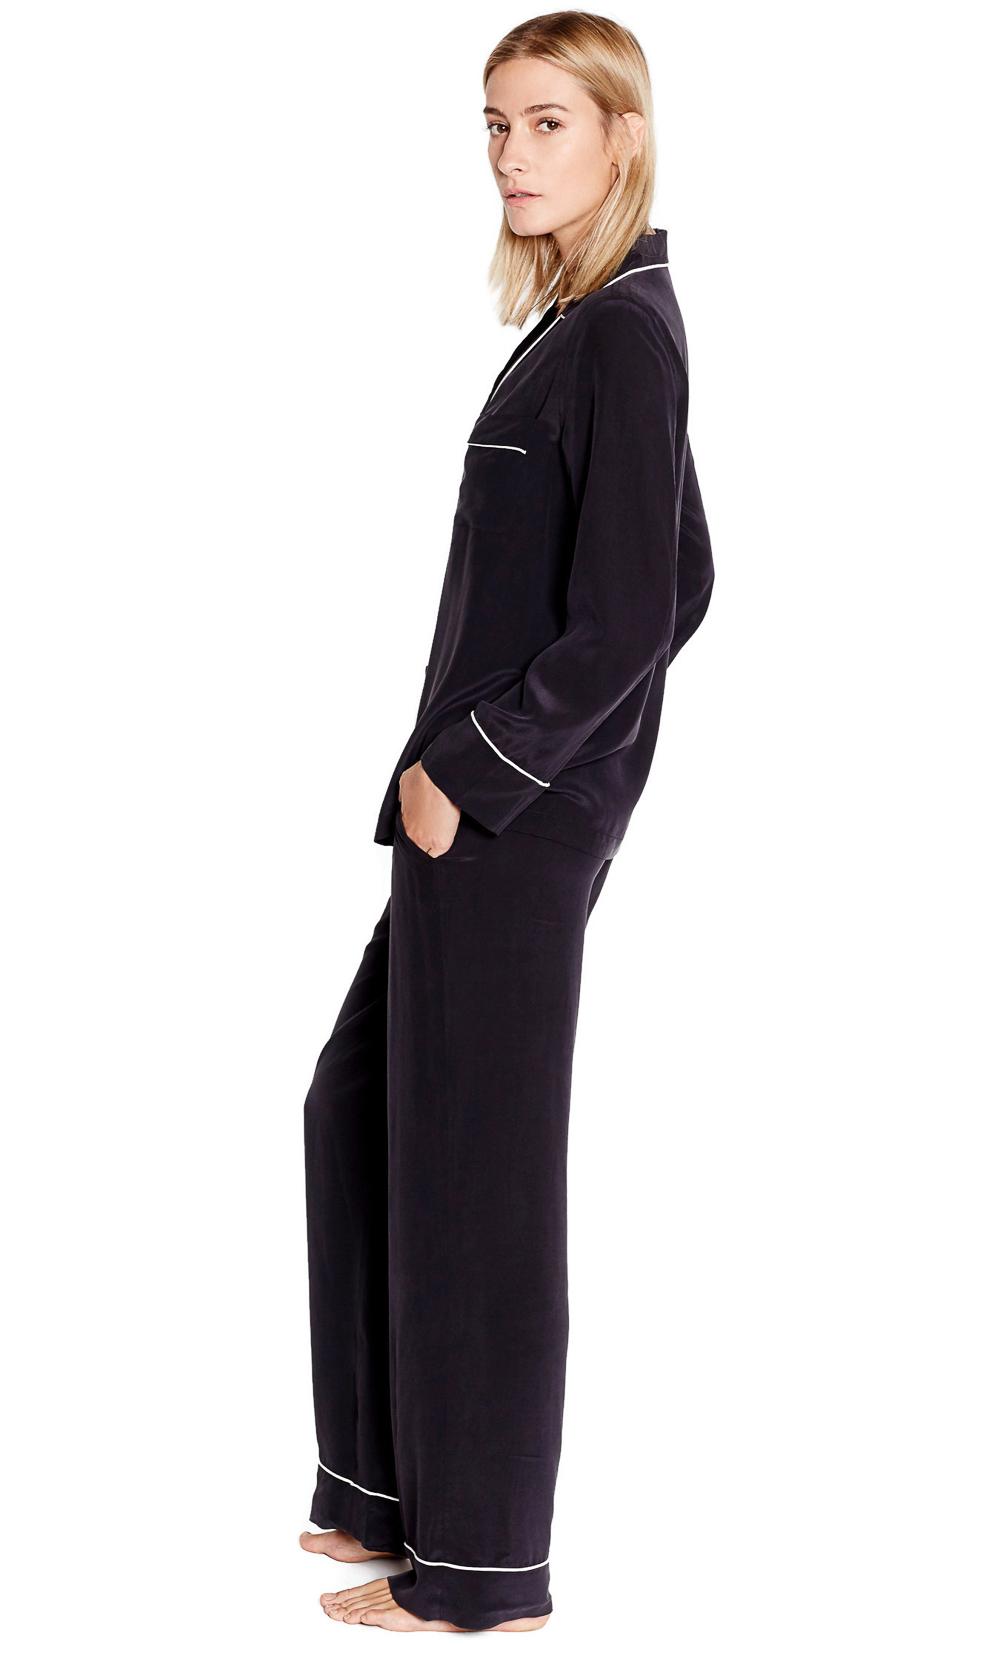 Women's Luxurious Sleepwear & Pyjamas